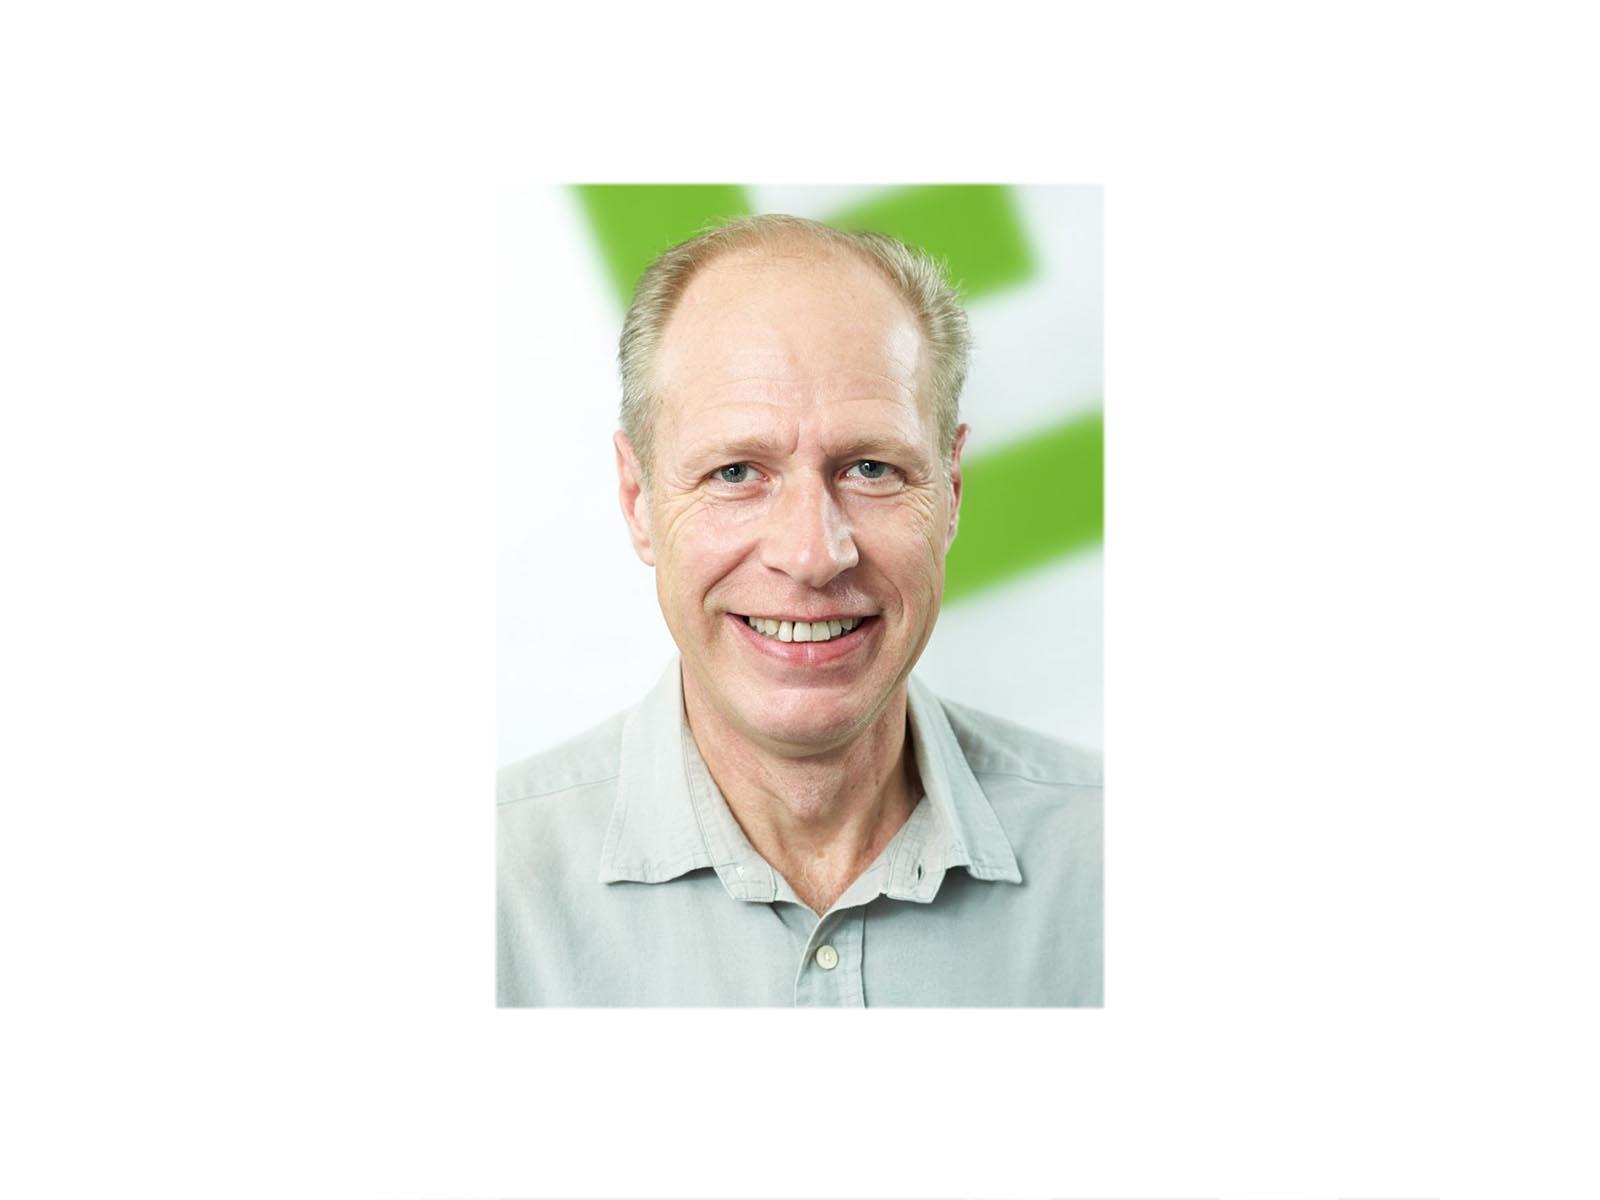 Markus Huber, Vorstand Grüne Kreis 6/10